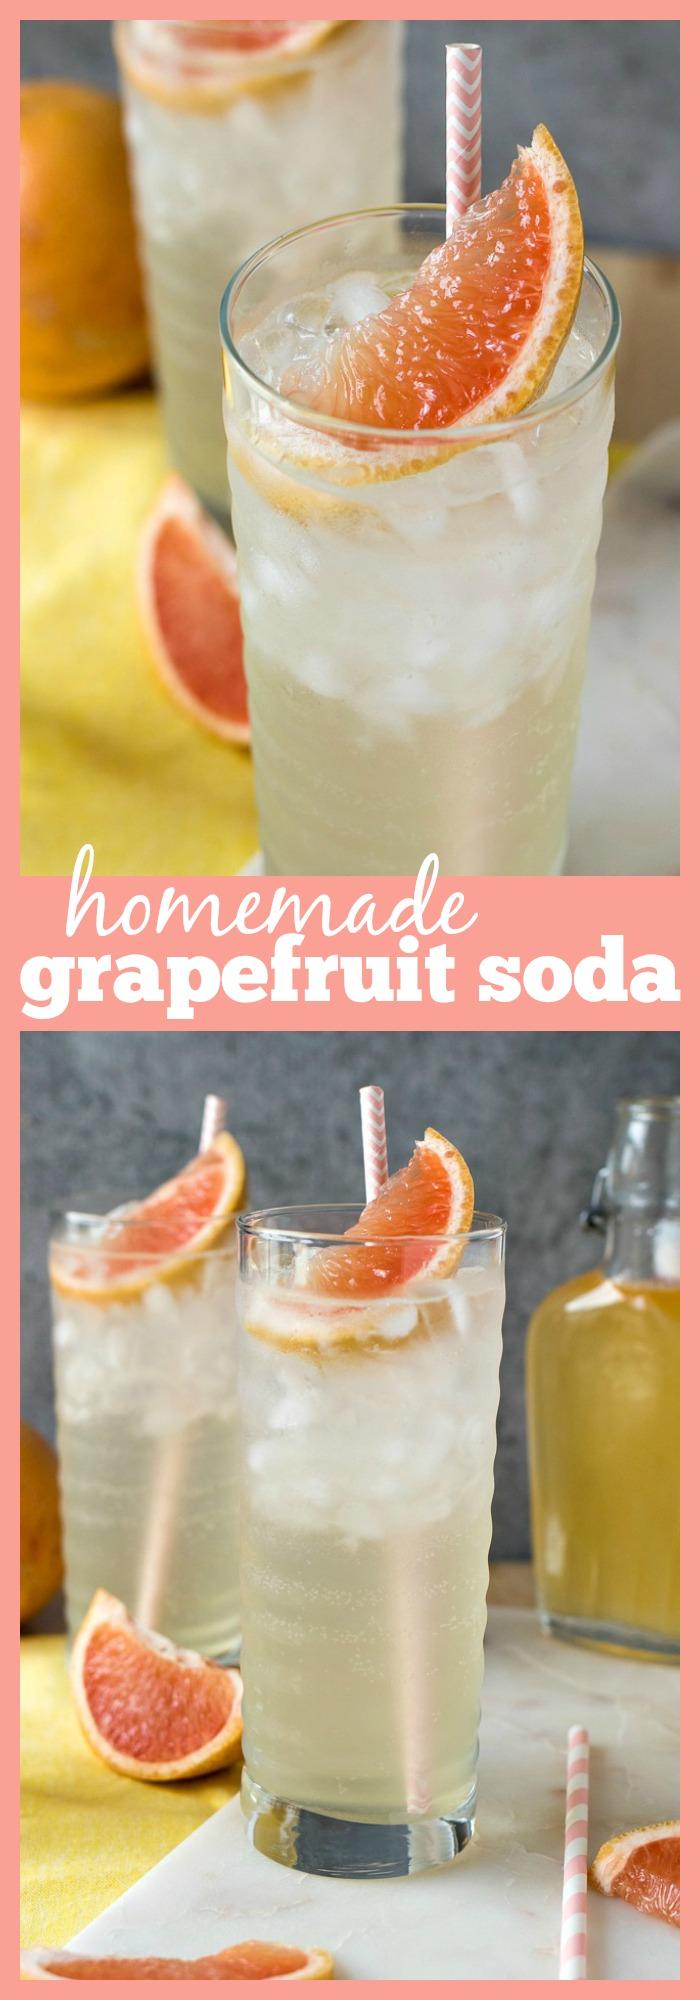 Homemade Grapefruit Soda collage